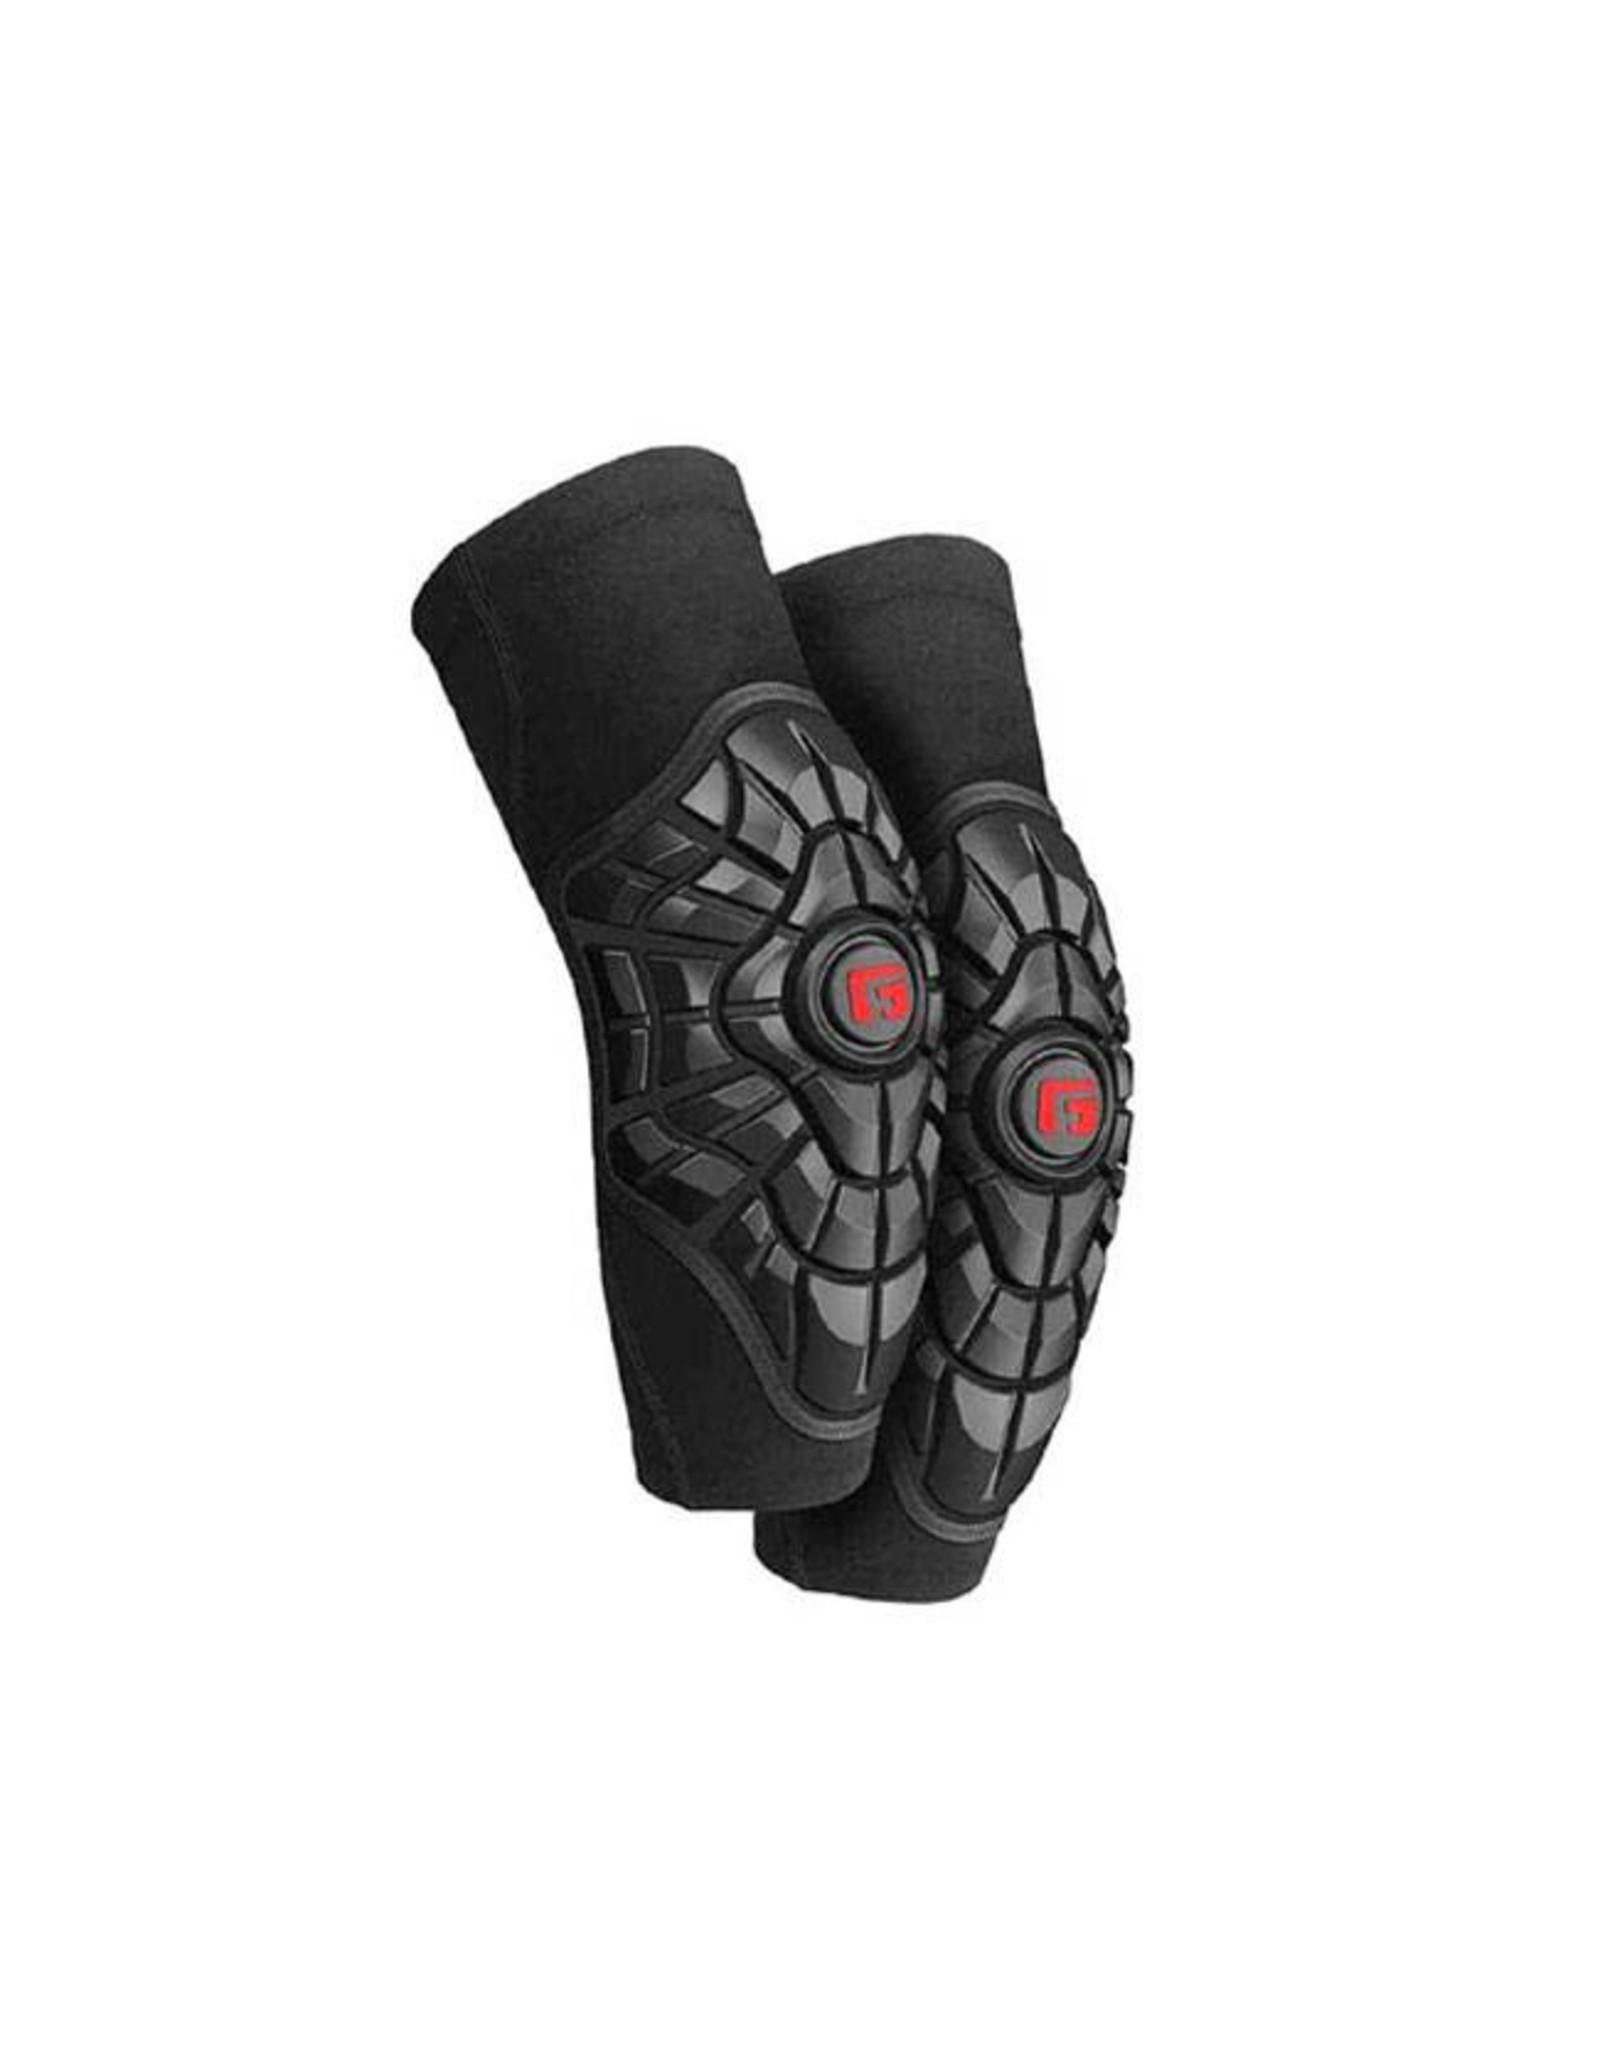 G-Form G-Form Elite Elbow Pad: Black MD